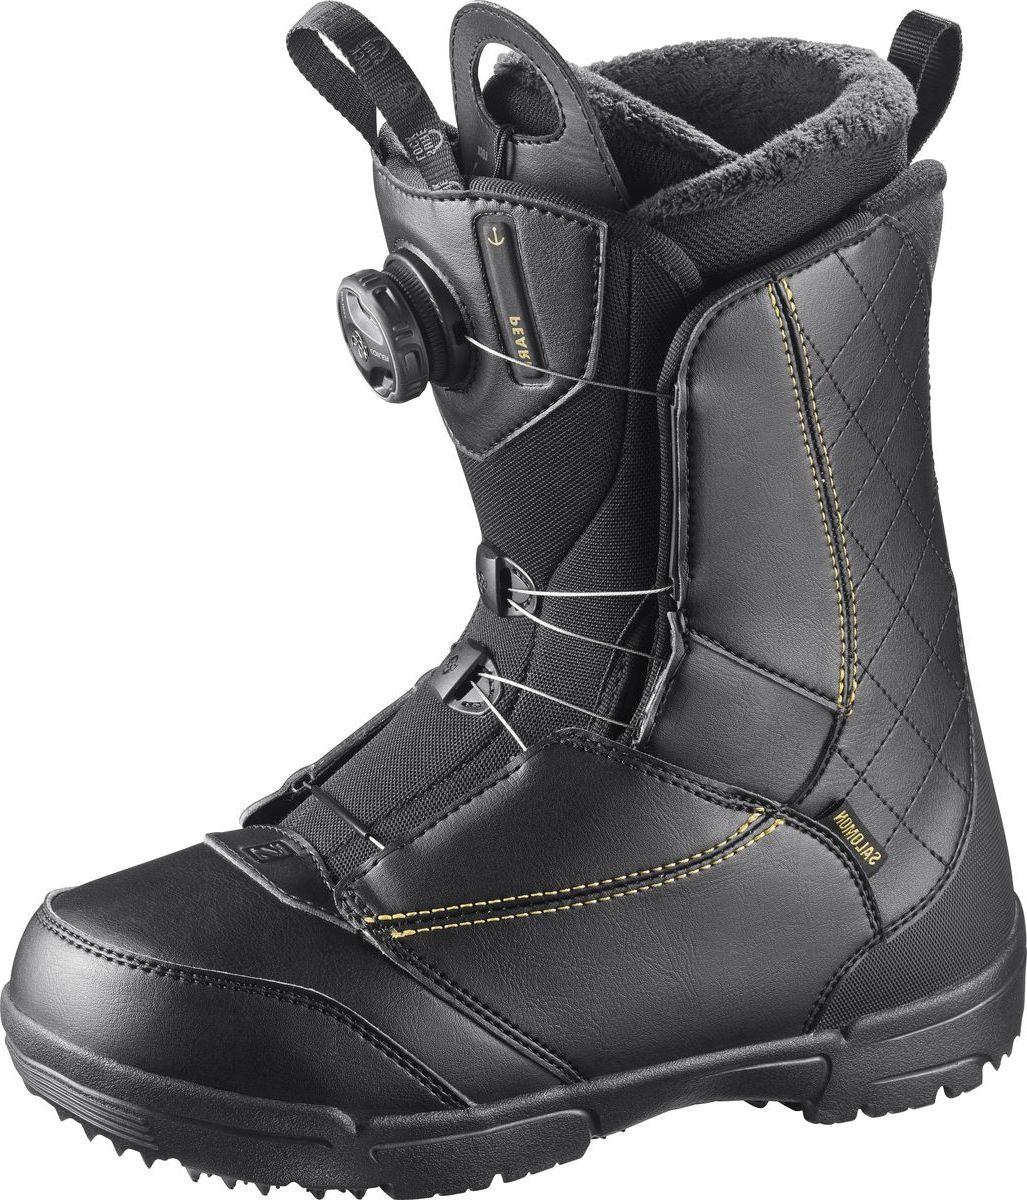 Ботинки для сноуборда Salomon Pearl Boa, цвет: черный, золотистый. Размер 25,5 (39) ботинки для сноуборда мужские salomon dialogue цвет черный размер 42